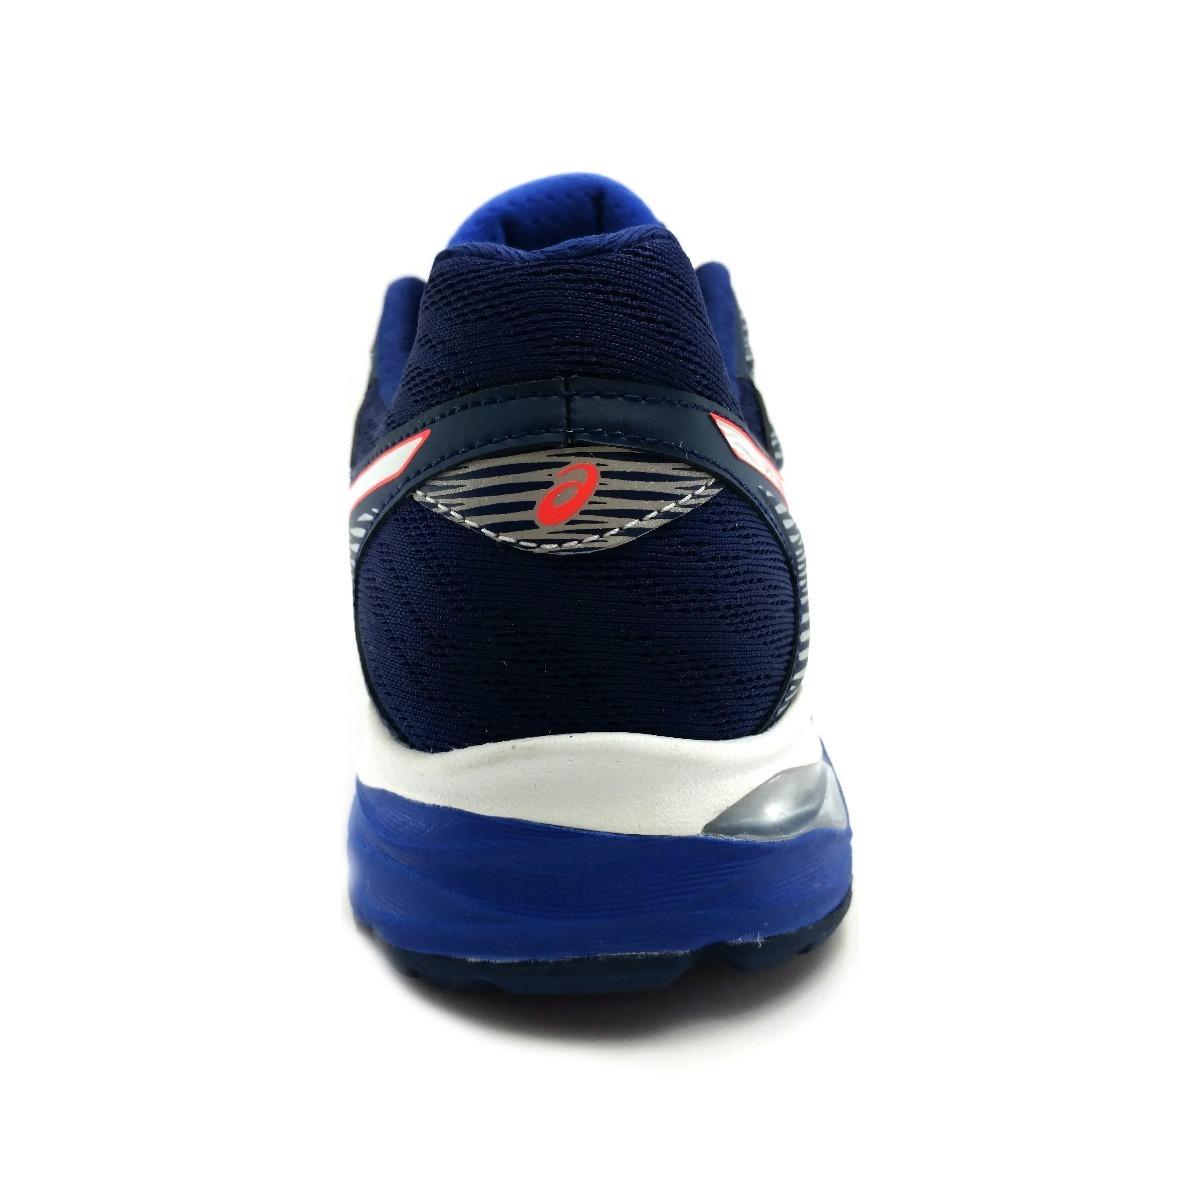 806bbe88563 tenis asics gel flux 4 azul correr running. Cargando zoom.